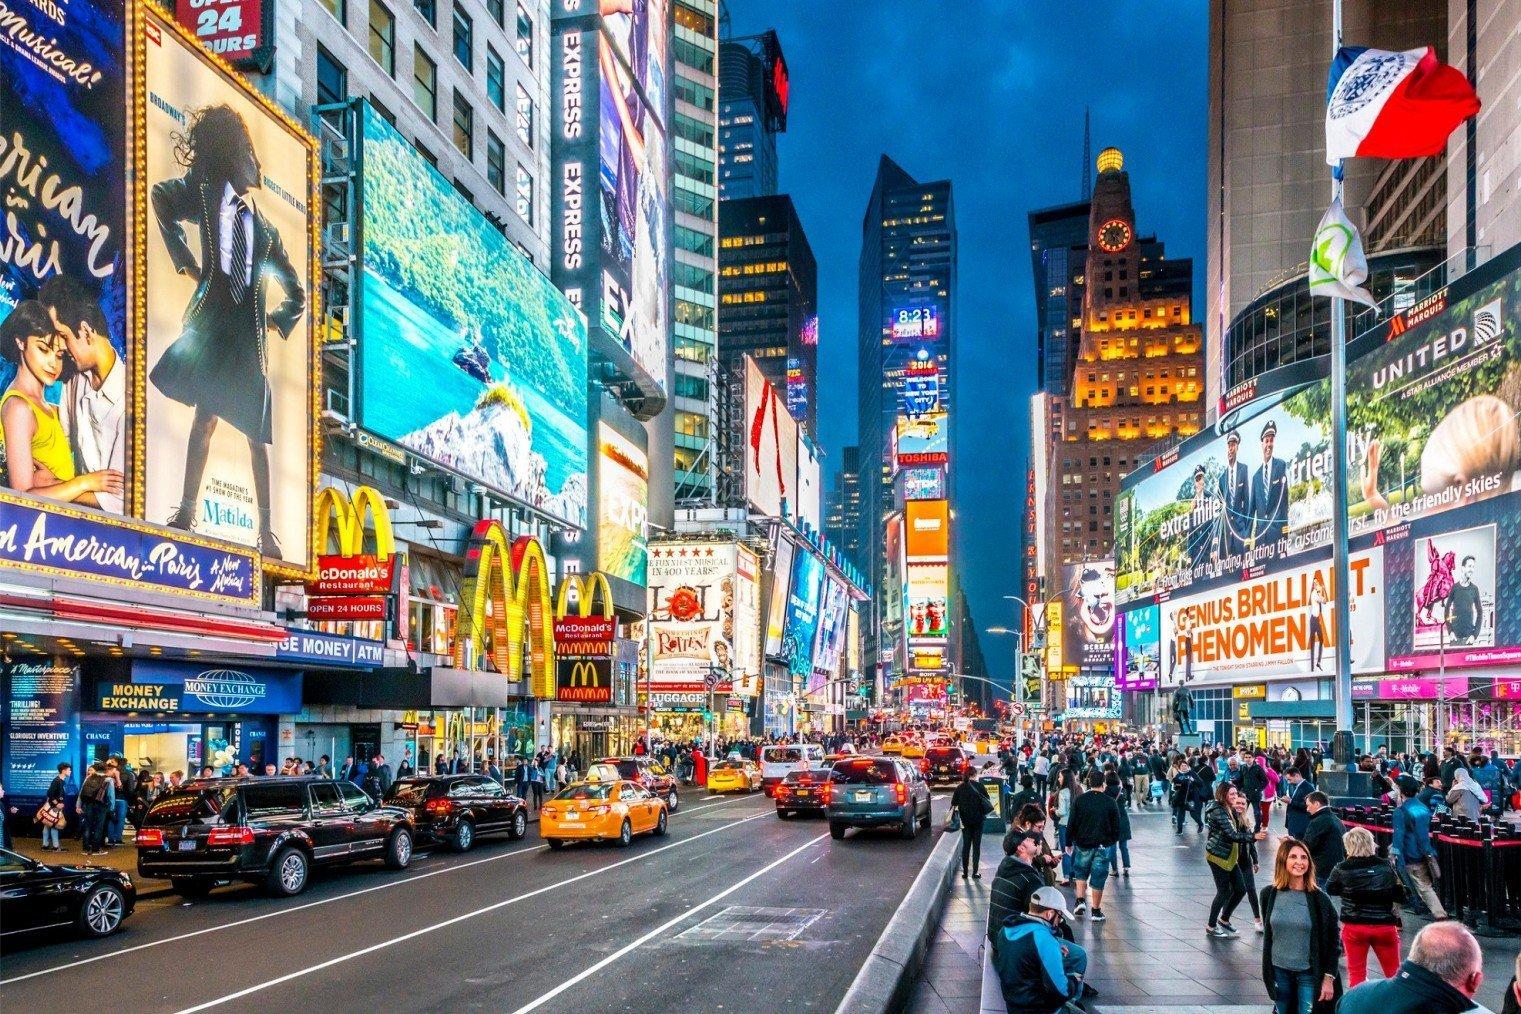 Таймс-сквер, Нью-Йорк. Times Square, New York City